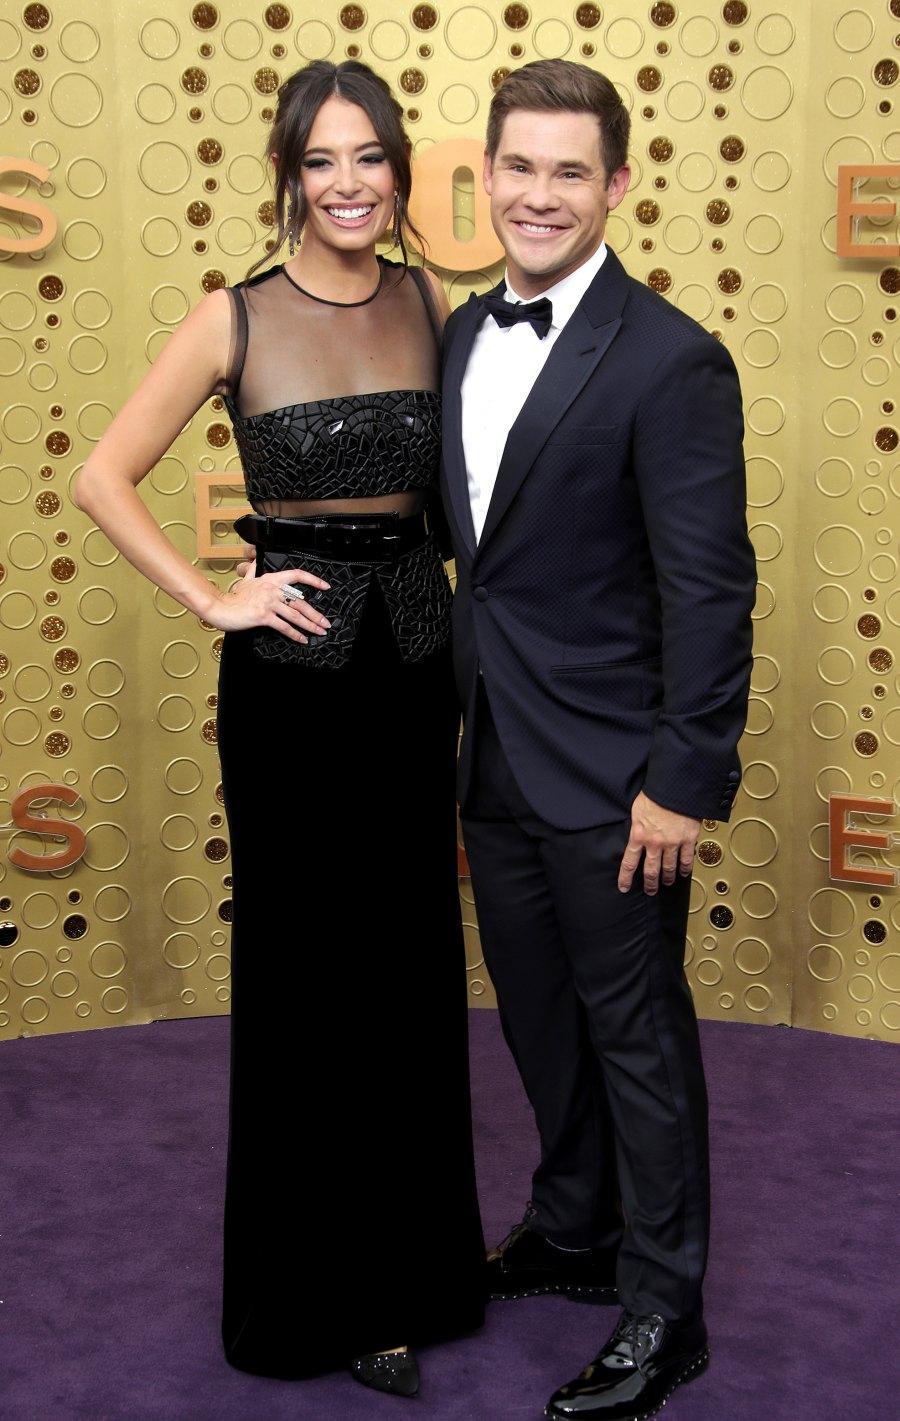 Emmys 2019 Stylish Couples - Chloe Bridges and Adam DeVine